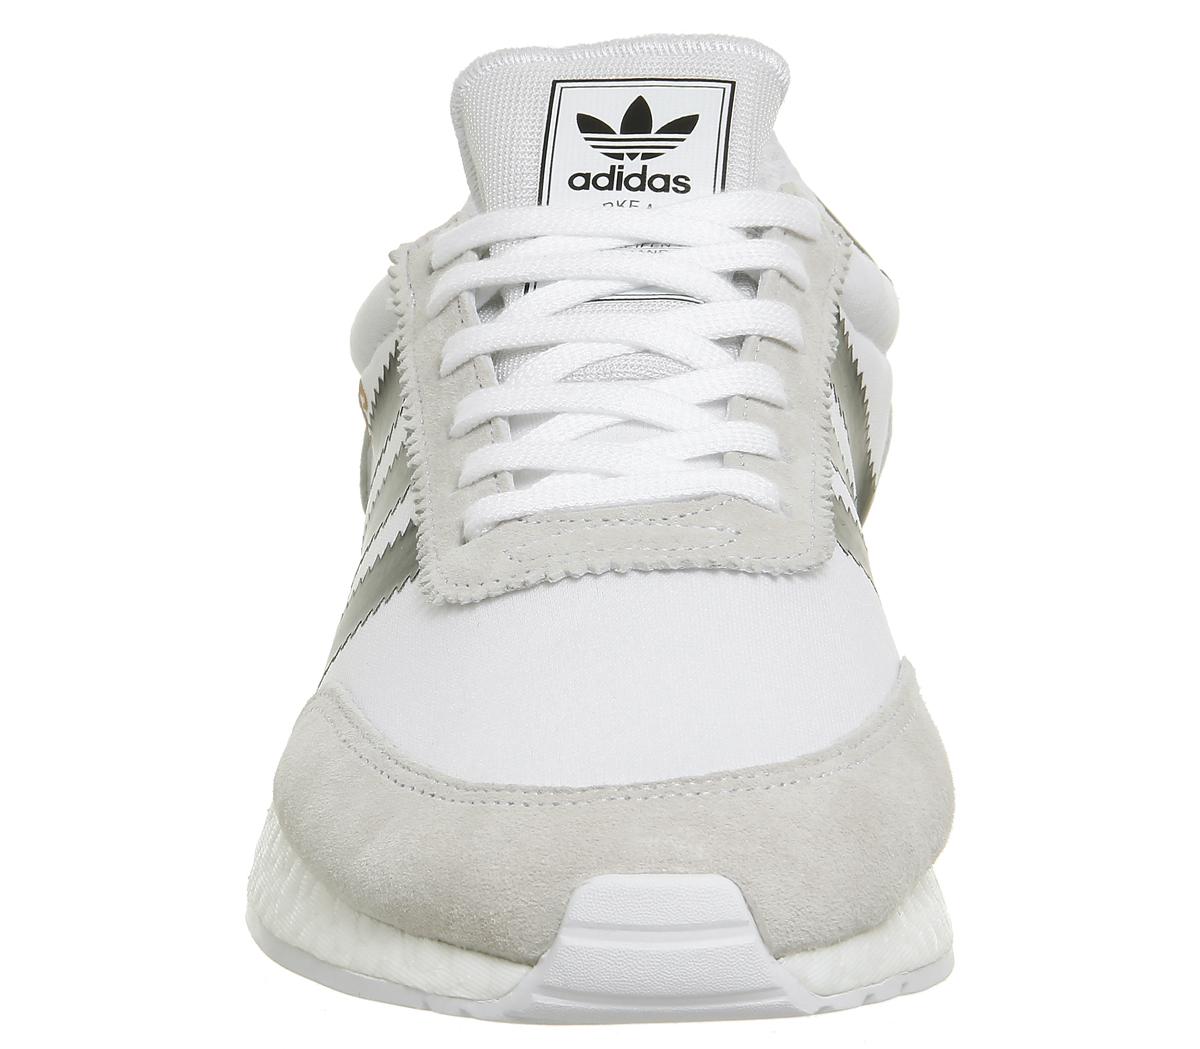 60c96d0bc917e Sentinel Mens Adidas I-5923 Trainers WHITE CORE BLACK COPPER Trainers Shoes